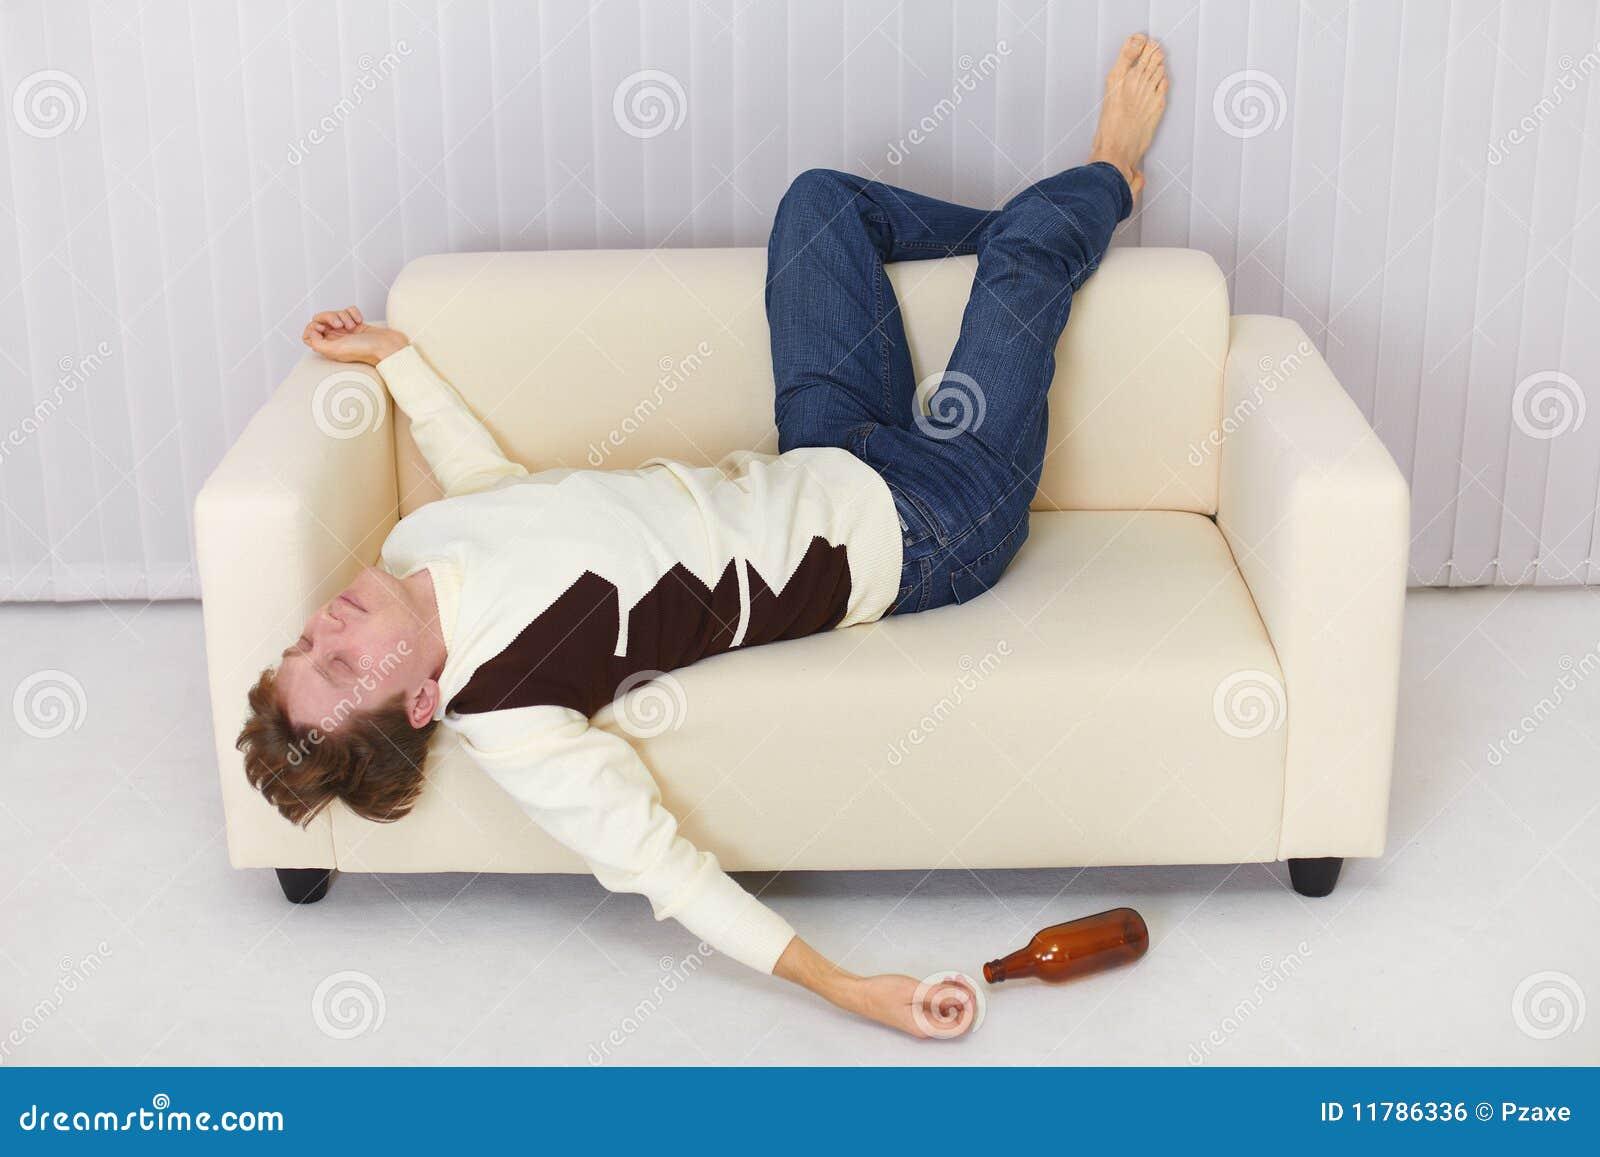 Пьяные пацаны на диване 2 фотография